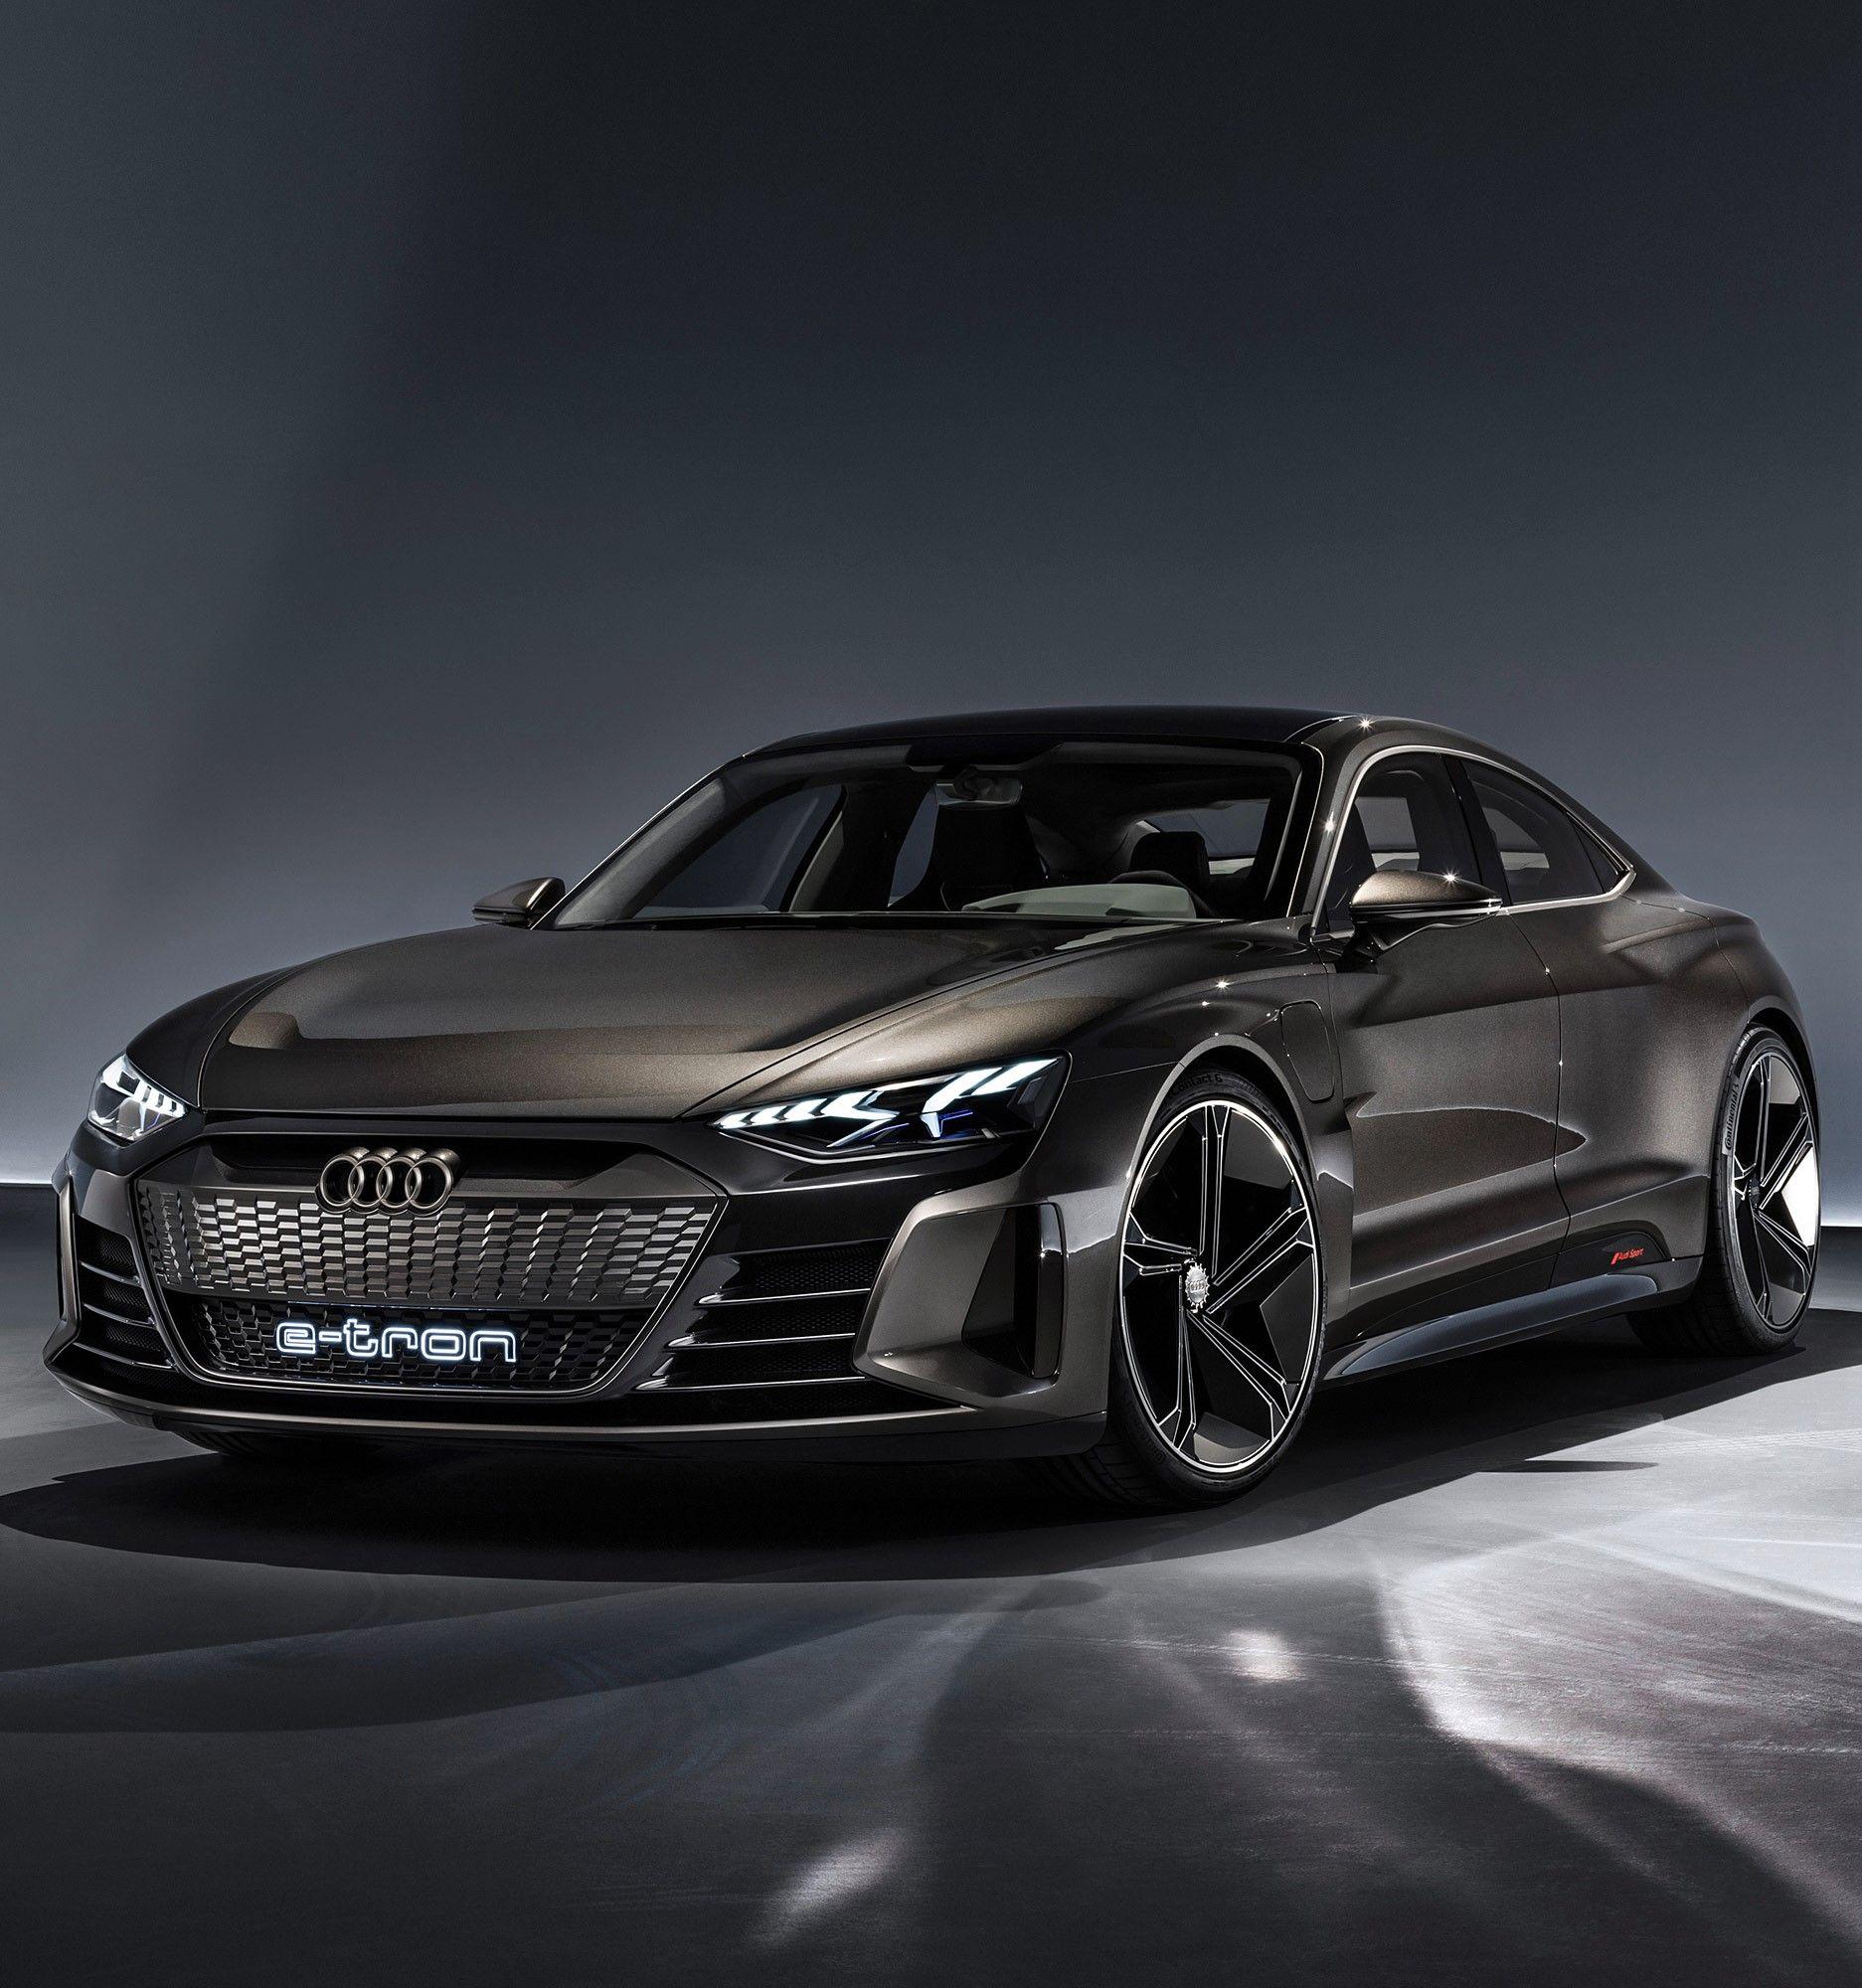 2018 Audi E Tron Gt Concept The Man Audi E Tron Audi E Tron